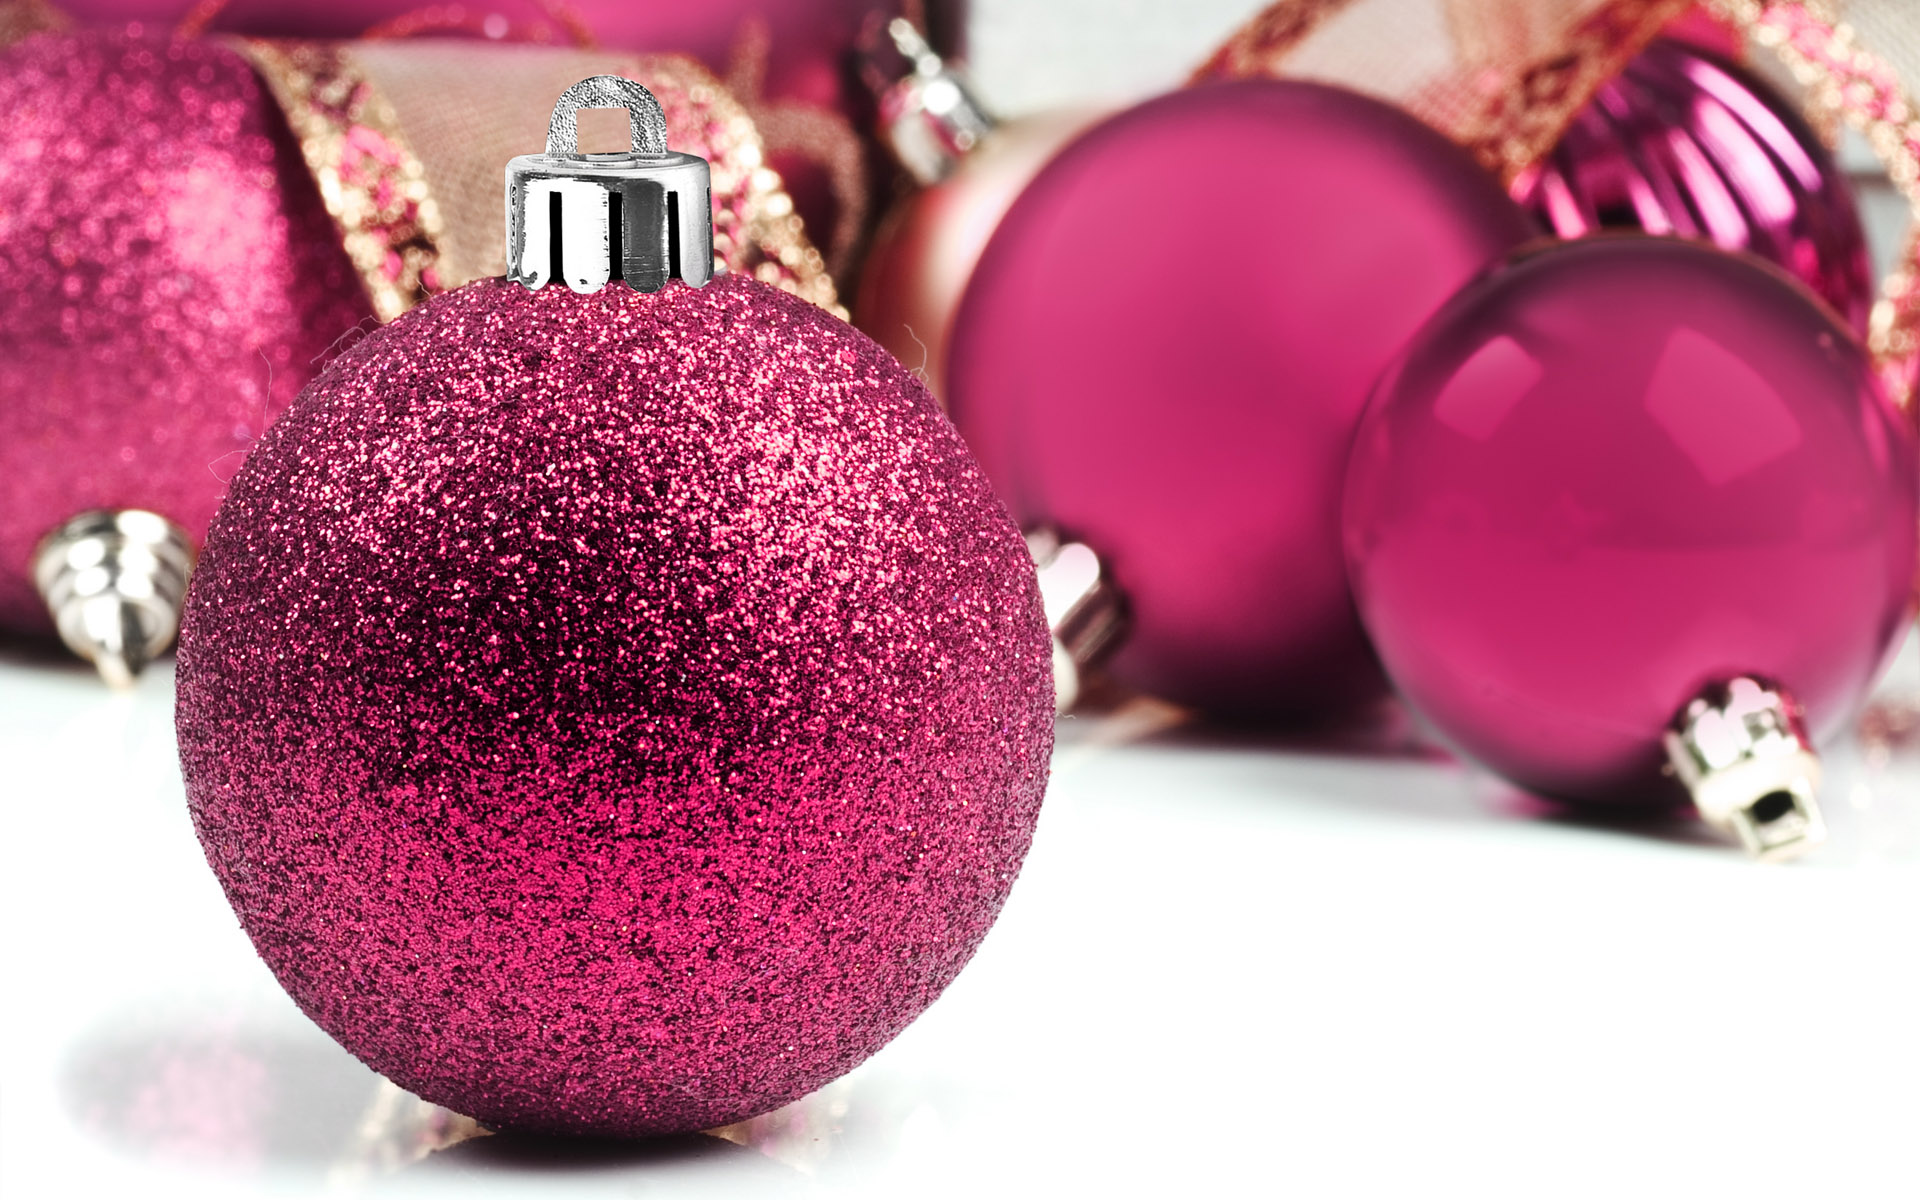 Christmas balls Christmas baubles and Christmas Decorations 1920x1200